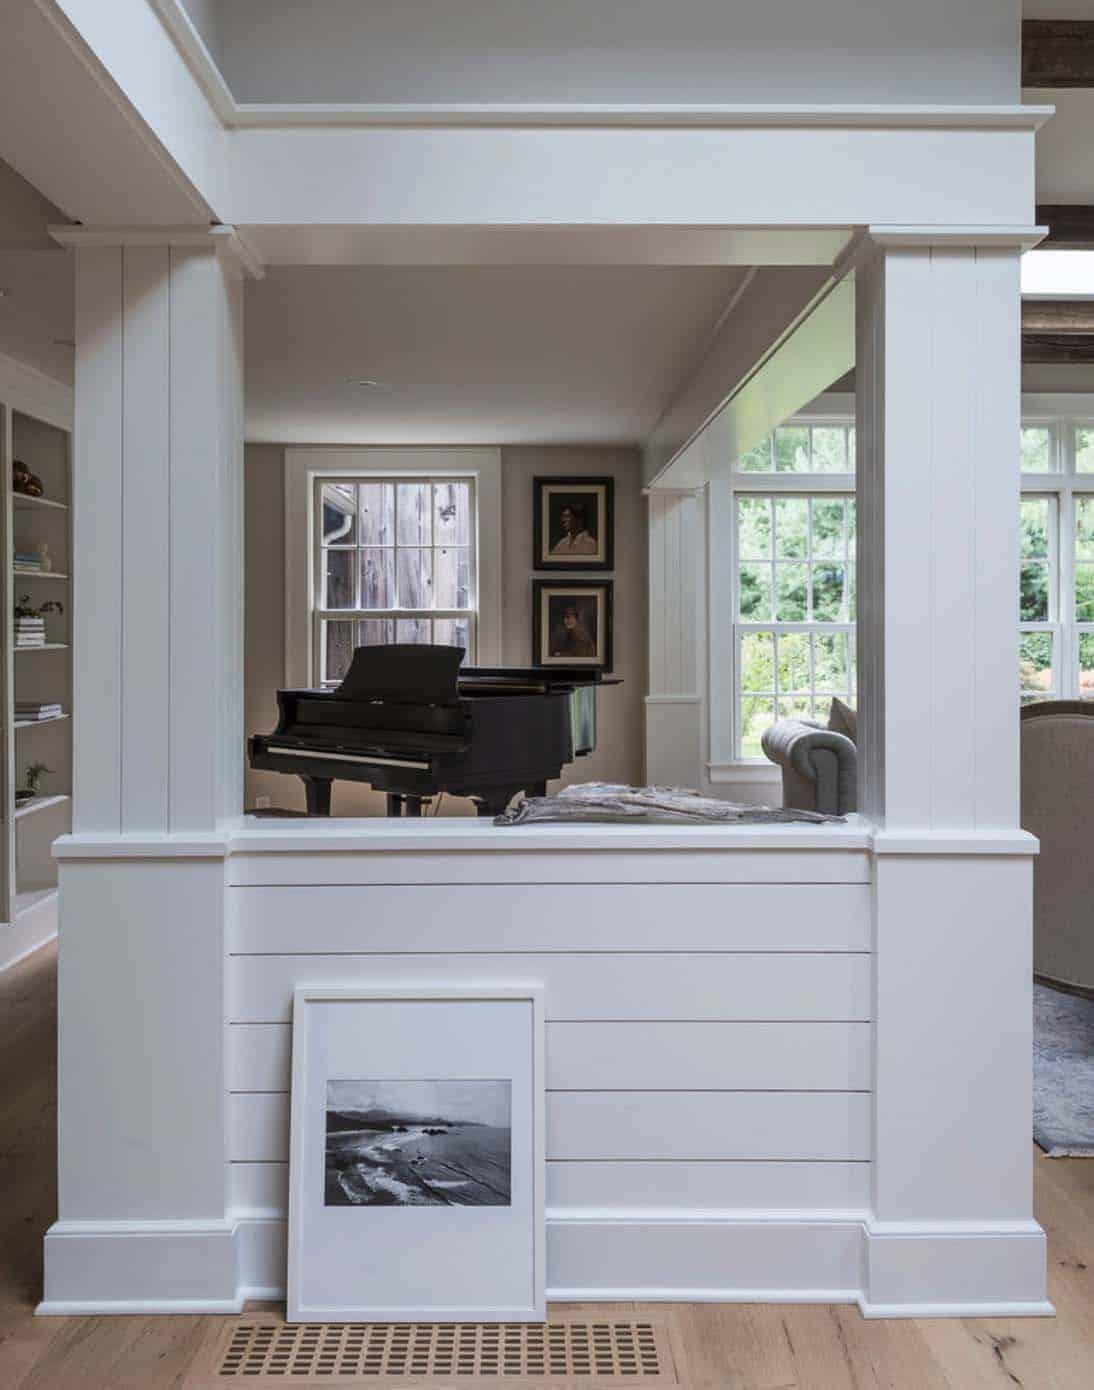 Farmhouse Style Home-Sellars Lathrop Architects-09-1 Kindesign